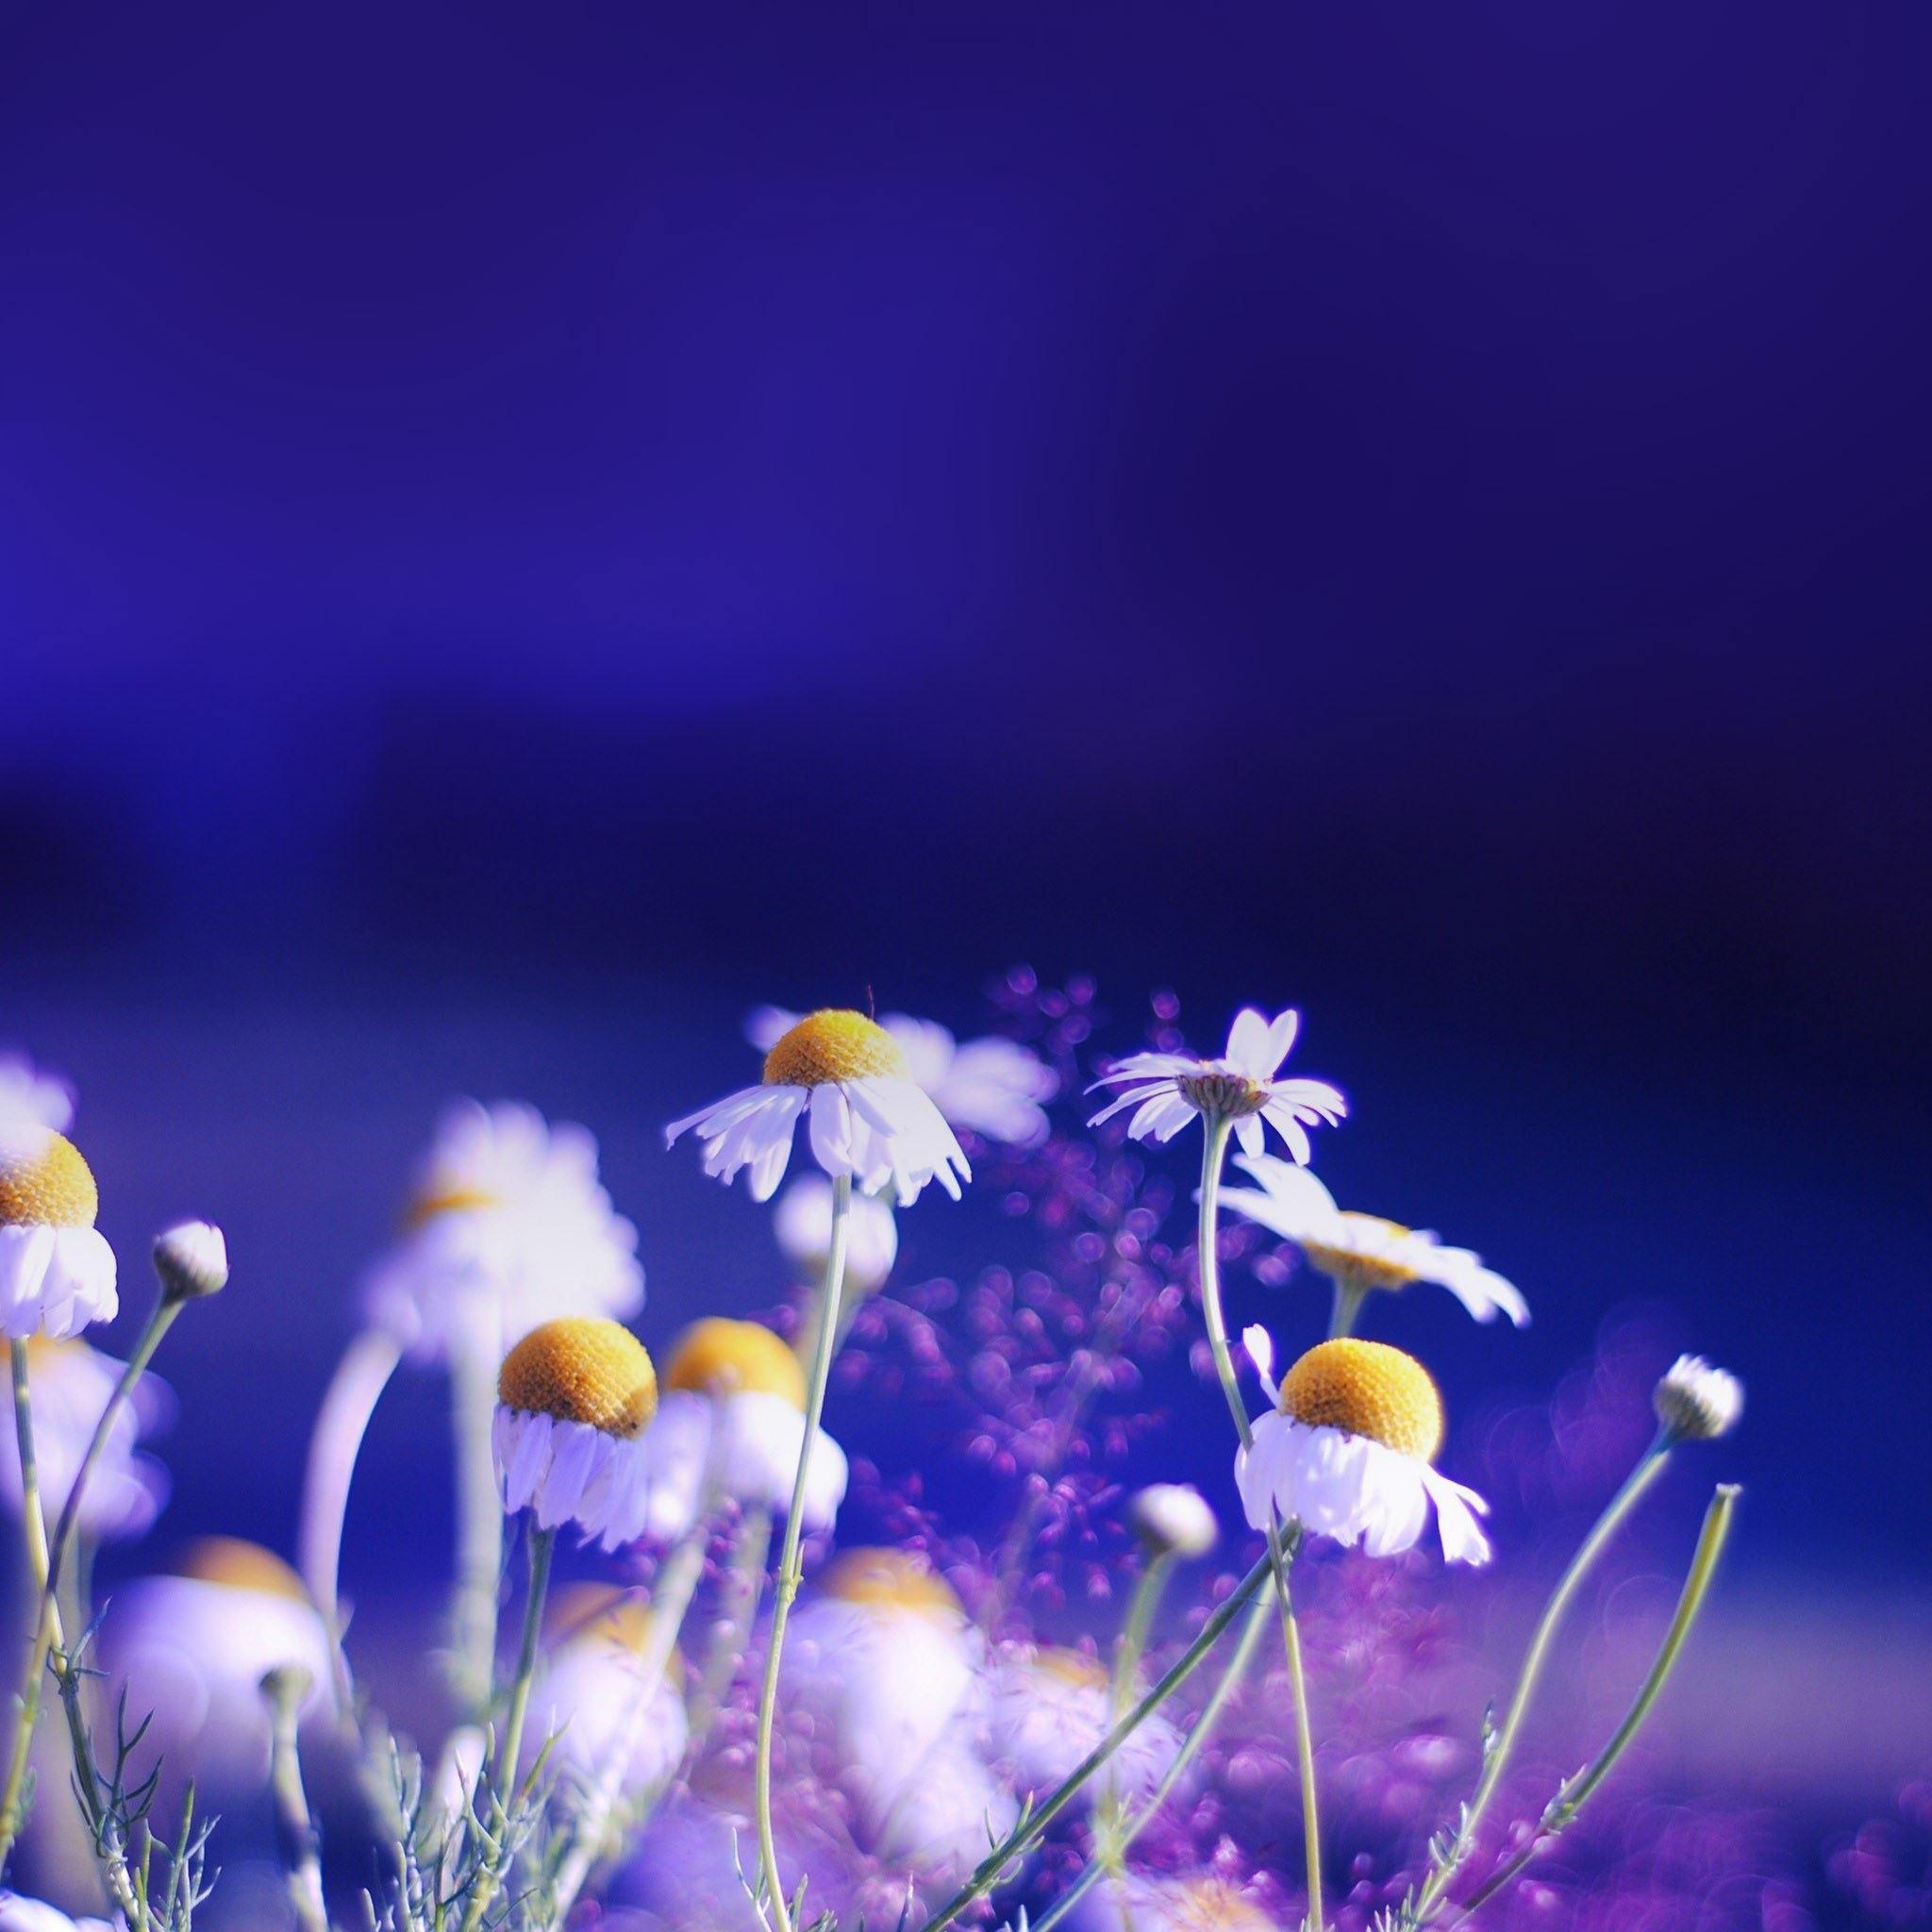 Dreamy Night Wild Daisy Plant Bokeh IPad Air Wallpaper